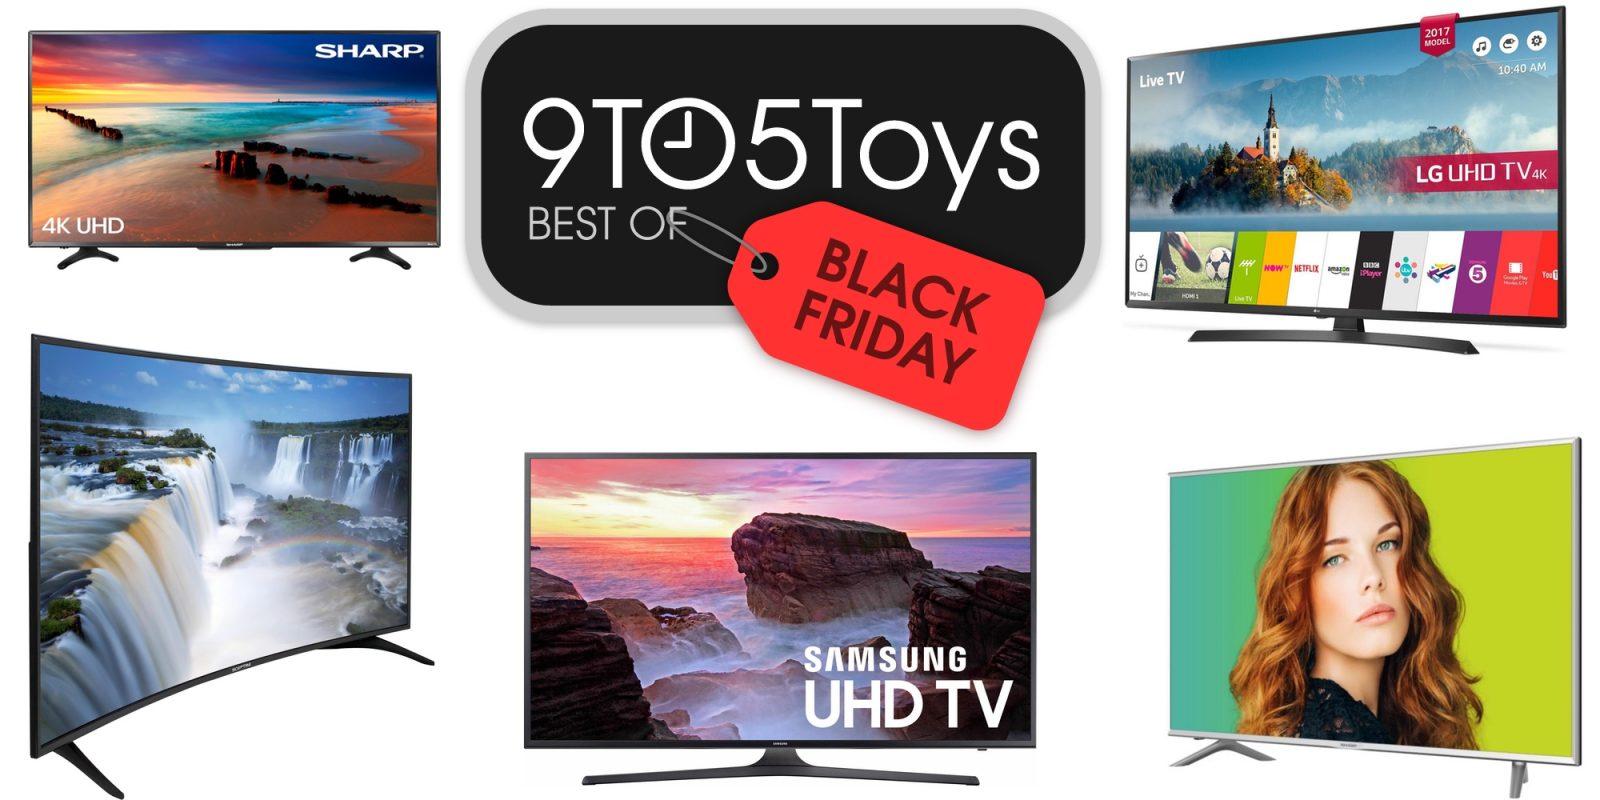 Best of Black Friday 2017 - 4K Ultra HDTVs: Sharp 50-inch